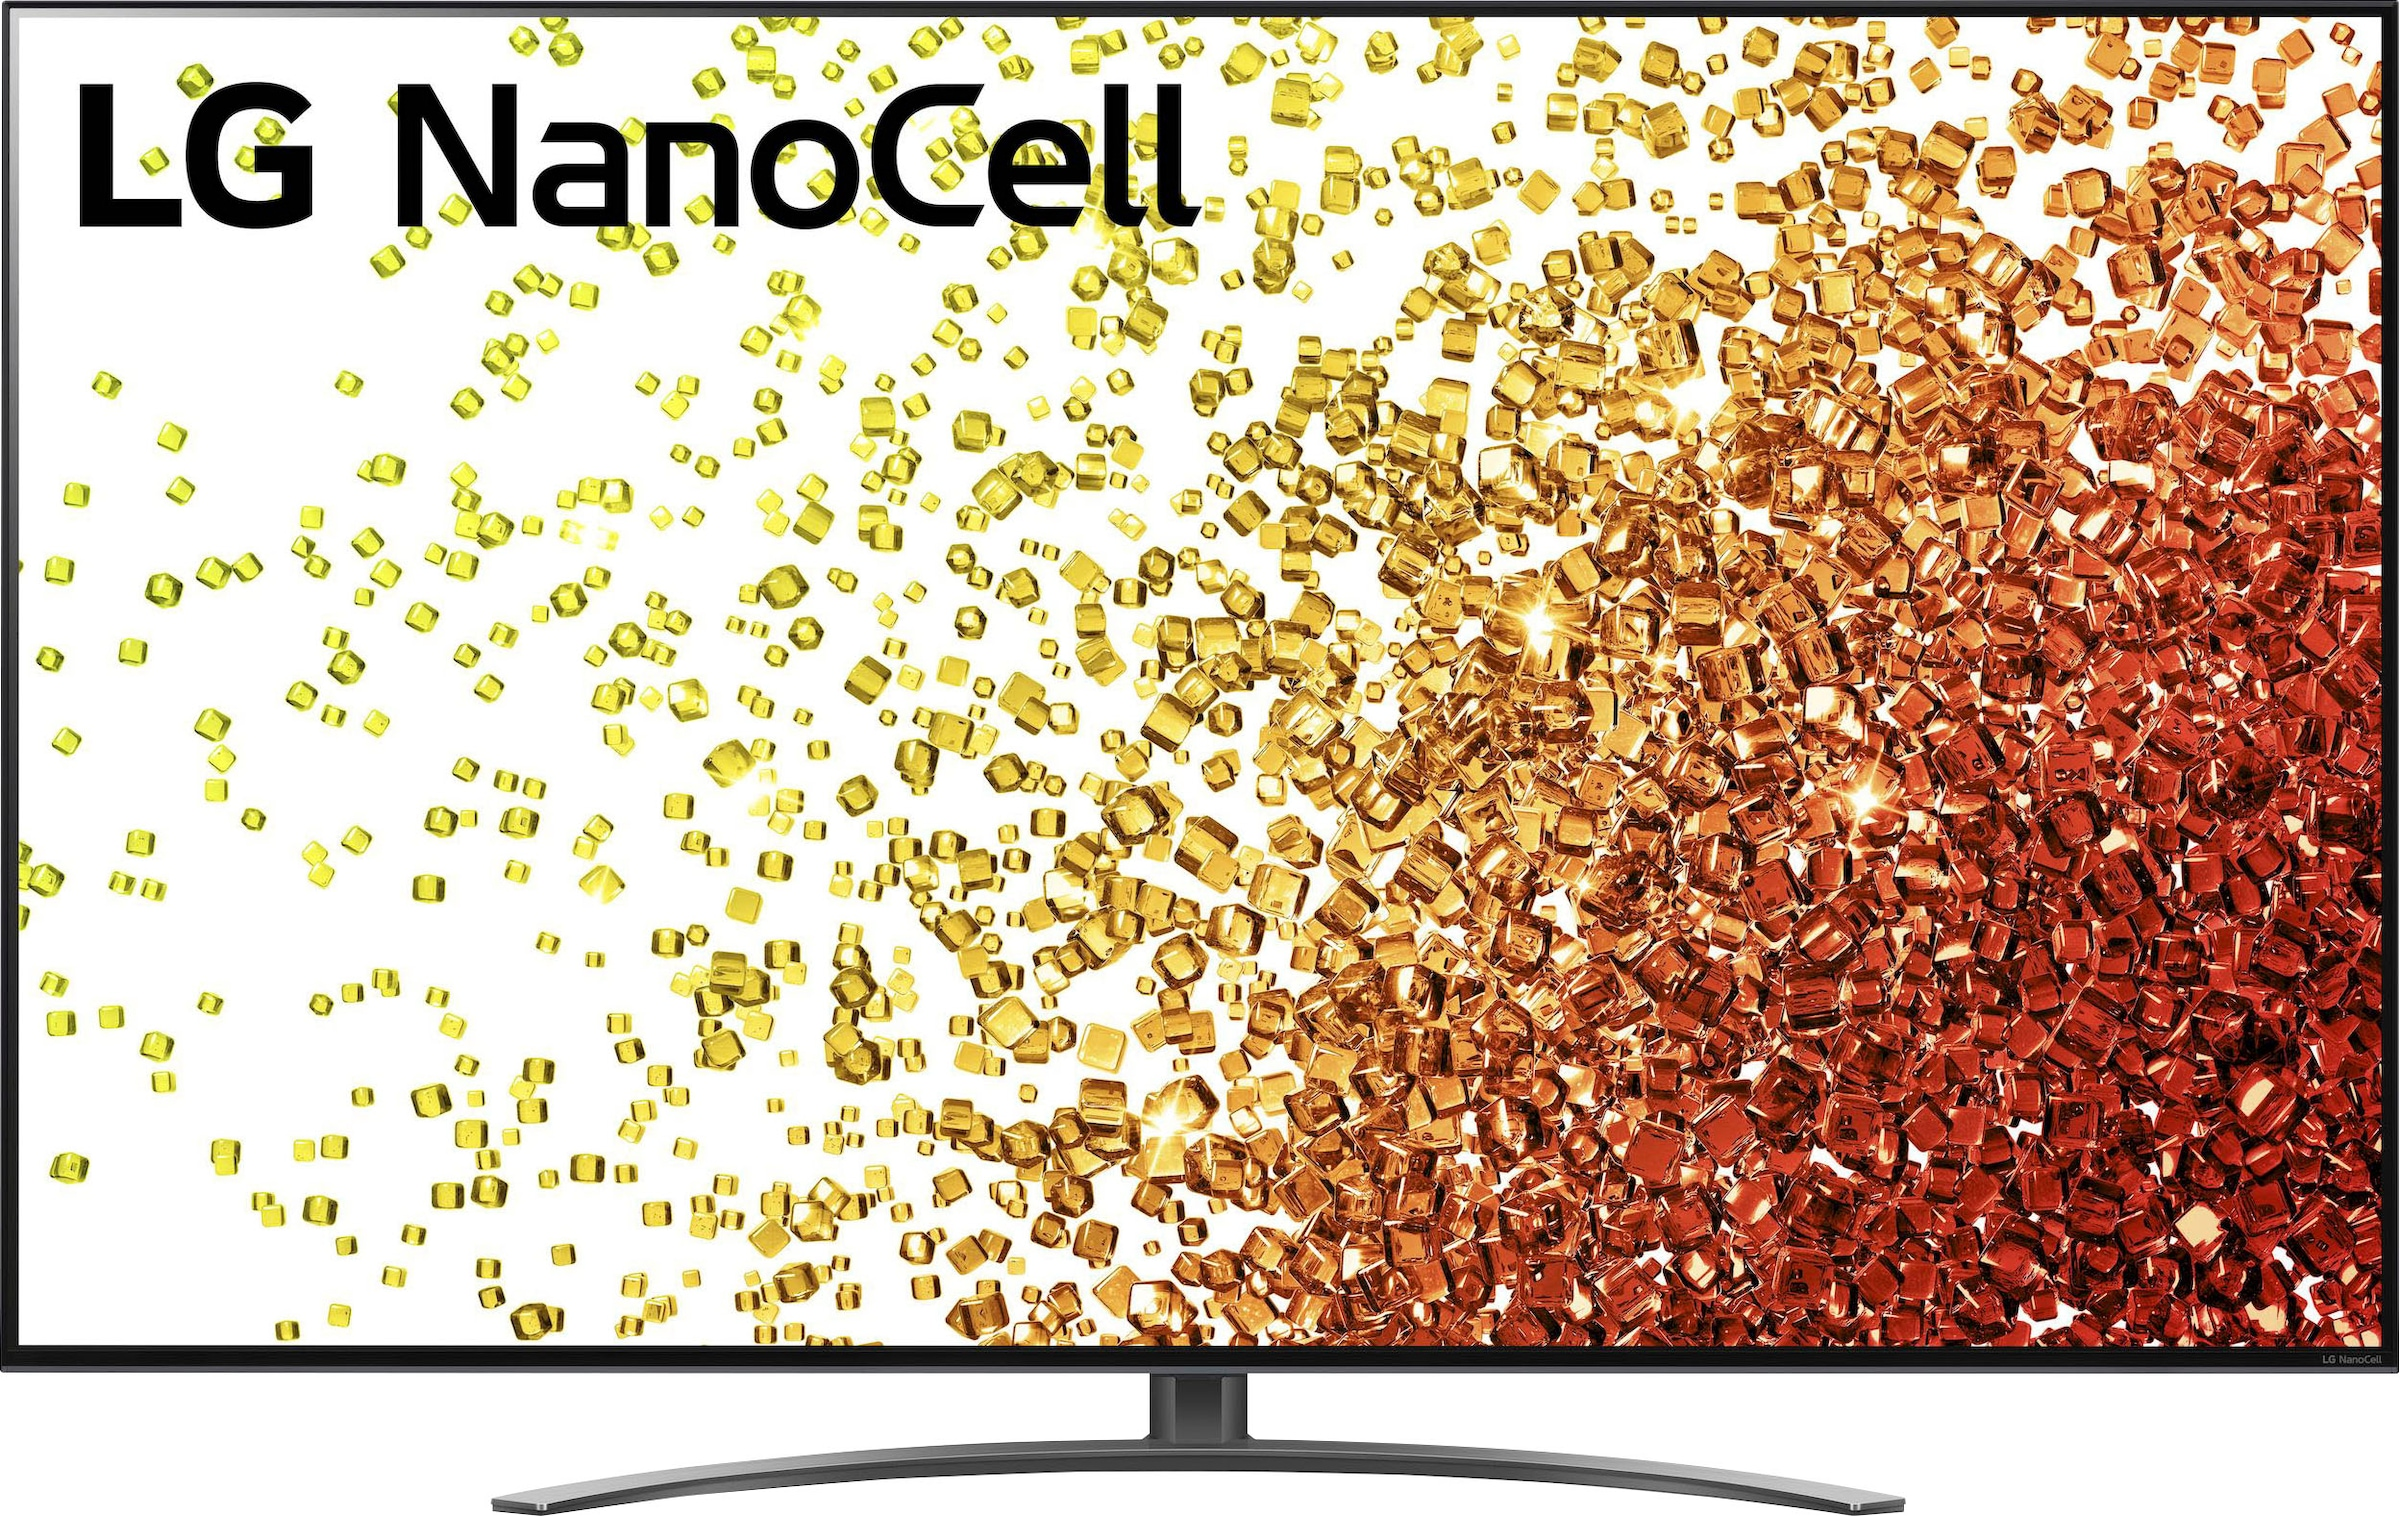 LG LCD-LED Fernseher 75NANO919PA , 189 cm 75 , 4K Ultra HD, Smart-TV, bis zu 120Hz -Full Array Dimming-α7 Gen4 4K AI-Prozessor-Sprachassistenten-HDMI 2.1